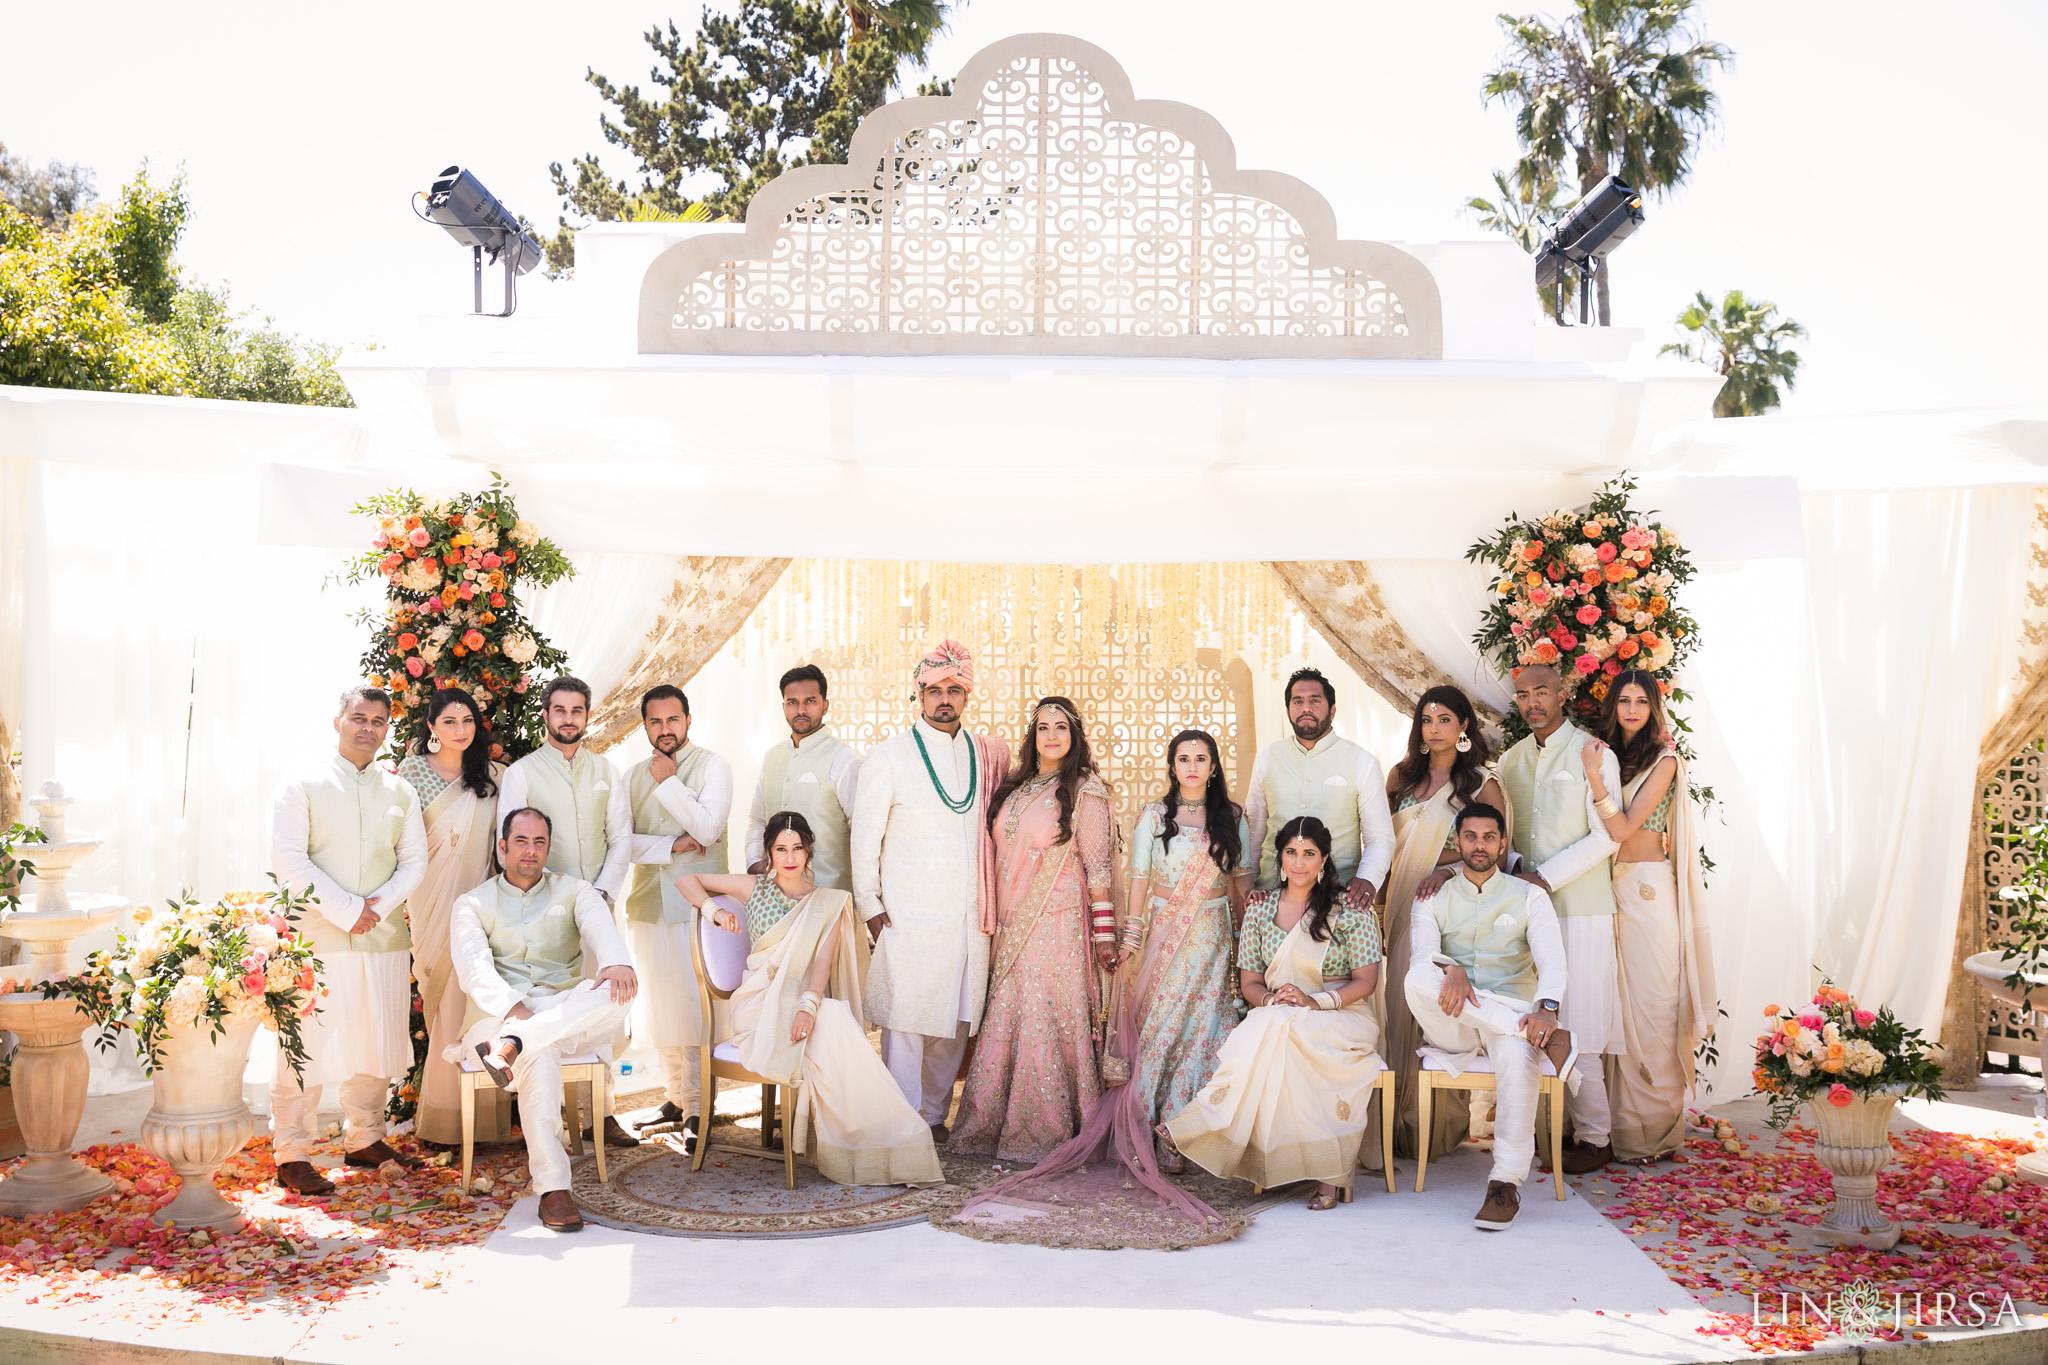 hyatt regency newport beach indian wedding